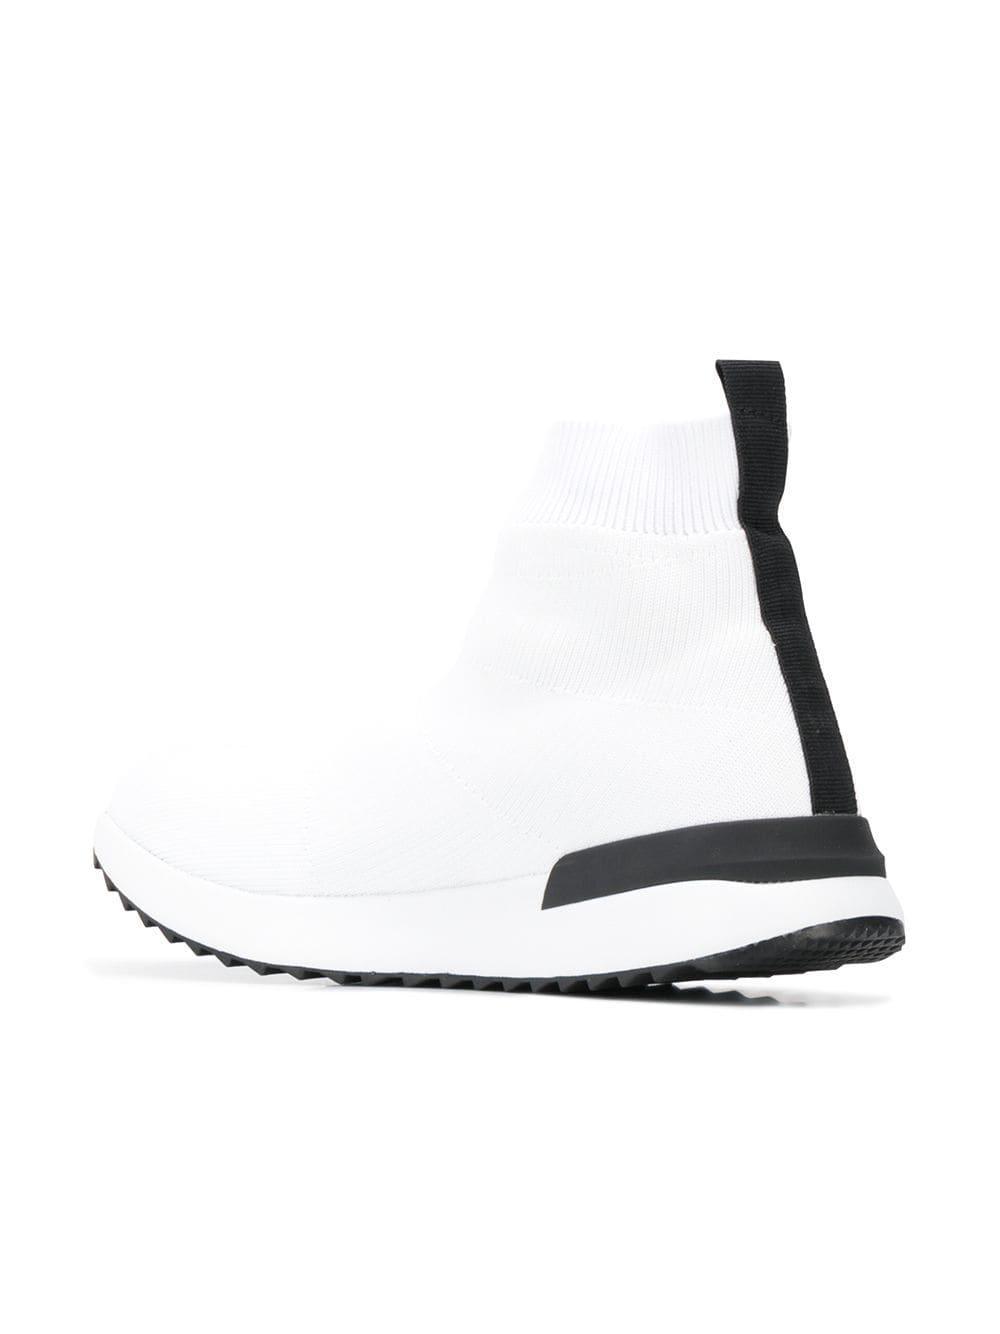 Versace Jeans Rubber Sock Sneakers in White - Lyst